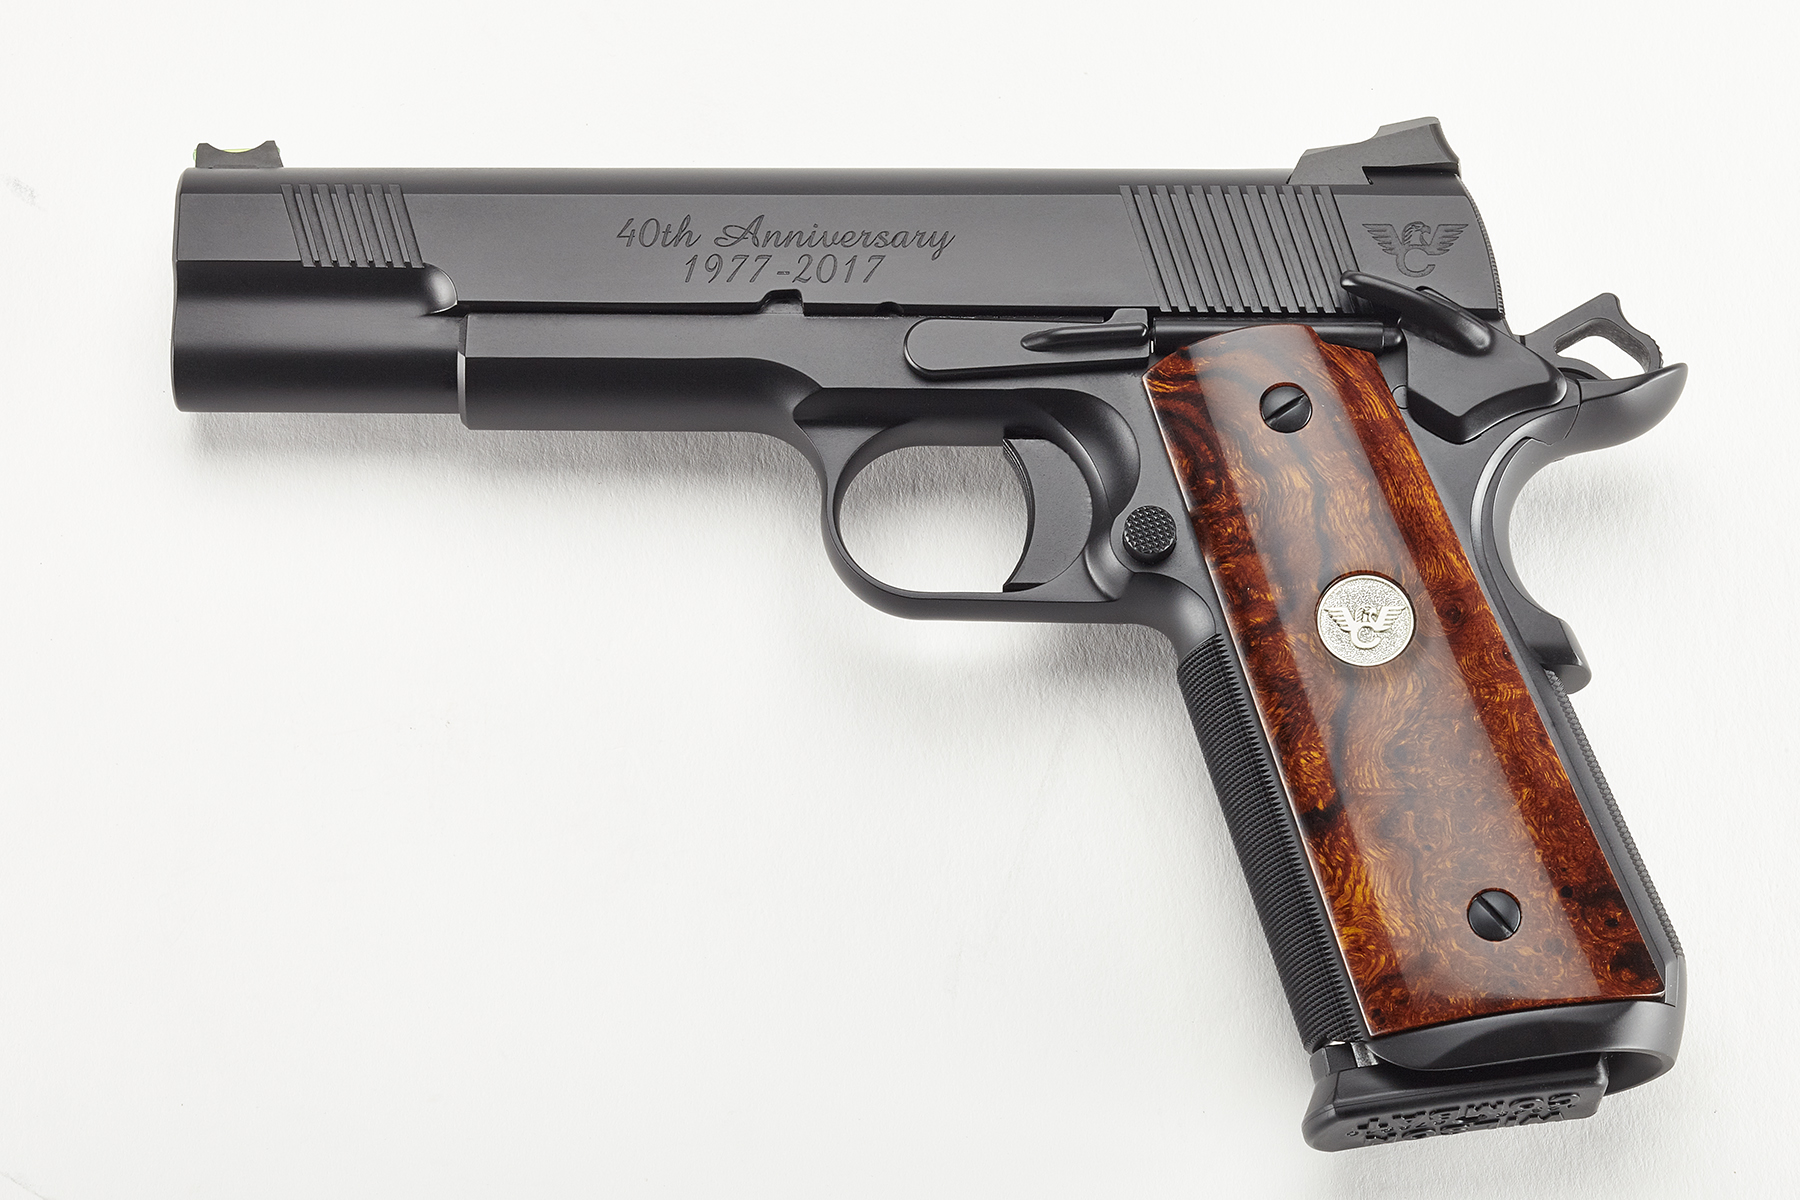 40th Anniversary 1911   Black Armor-Tuff   .45 ACP-https ...